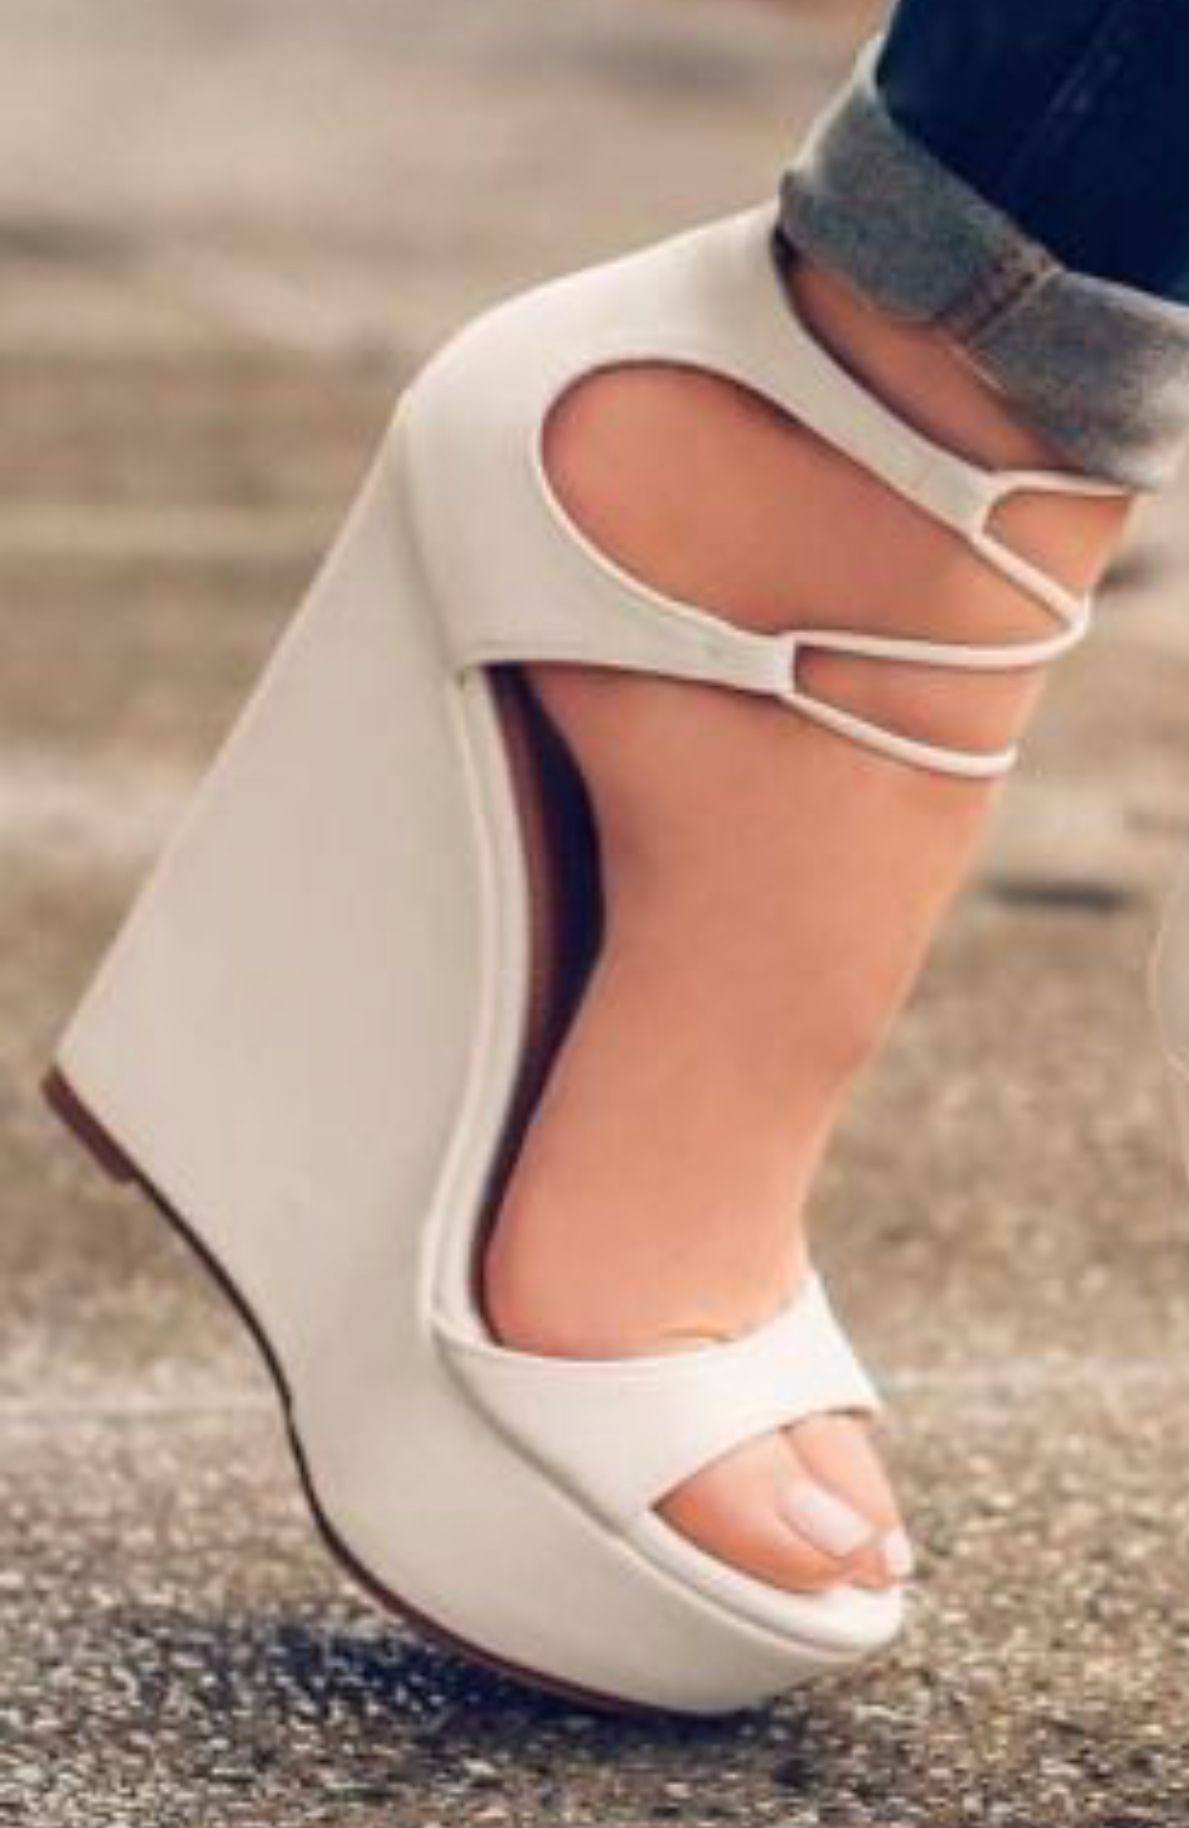 Y Damen Ohh I Wish Had'em Calzado Schuhe Hochhackige Schuhe 8qp8Cw